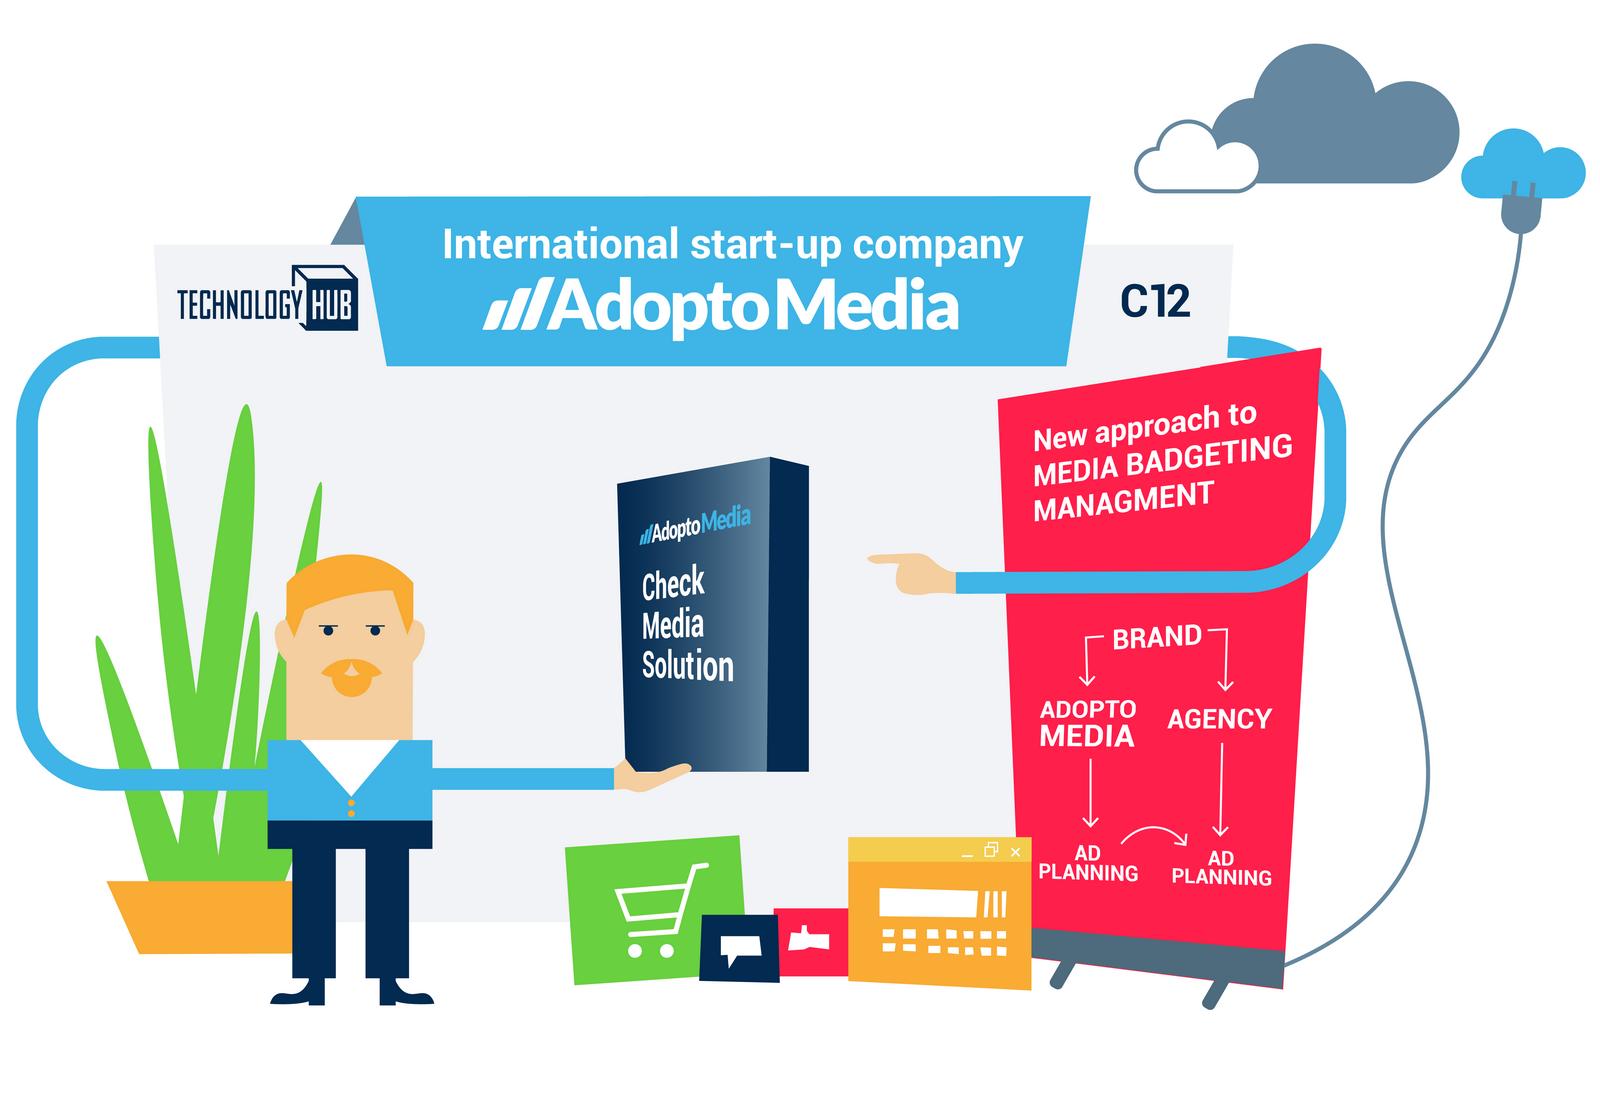 AdoptoMedia, Technology HUB 2018, CheckMedia Solution, фестиваль, оптимизация рекламного бюджета, технологичный софт, реклама